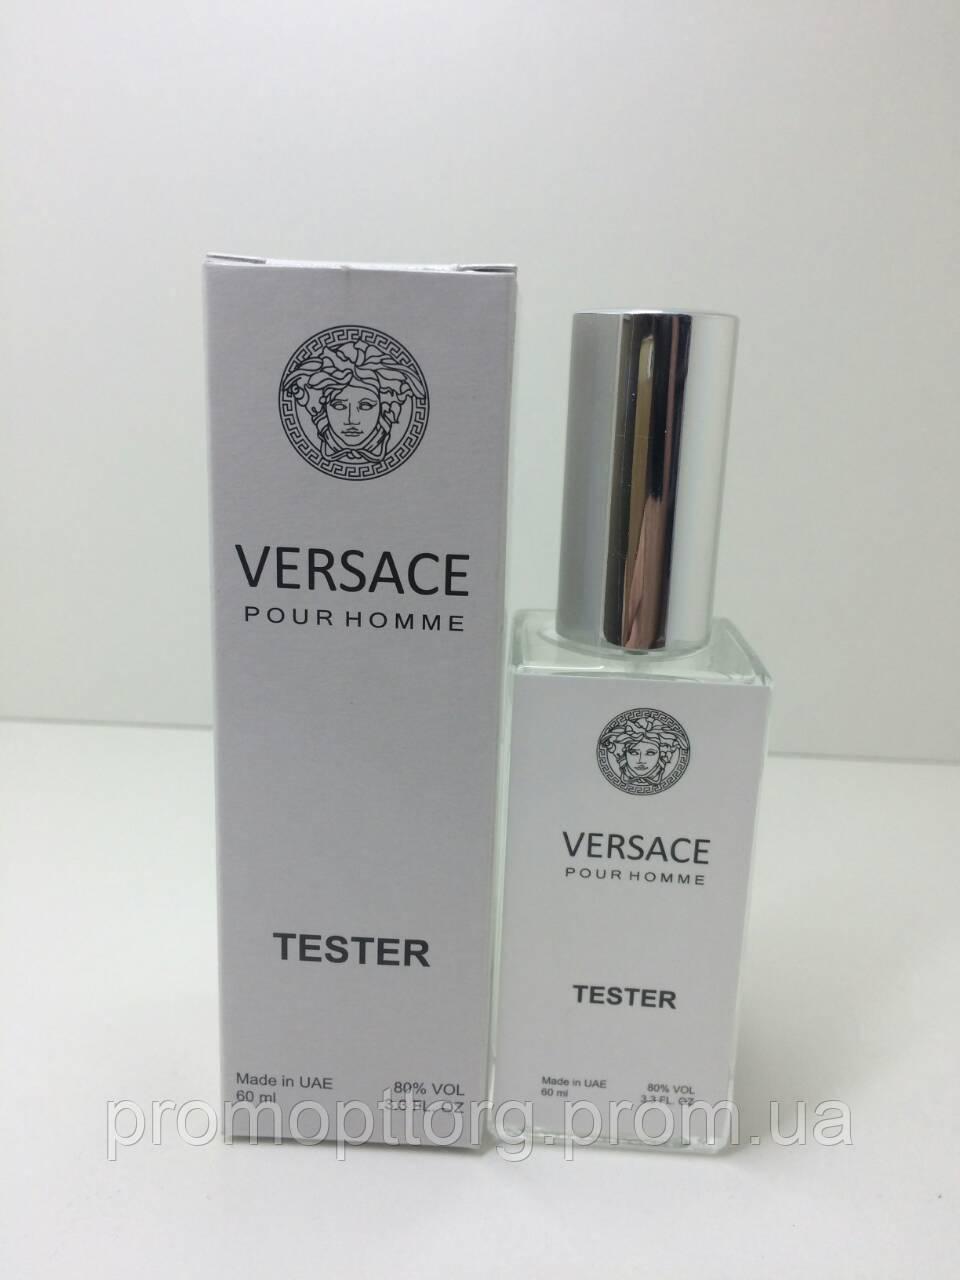 Мужская парфюмерия Versace Pour Homme тестер 60 ml